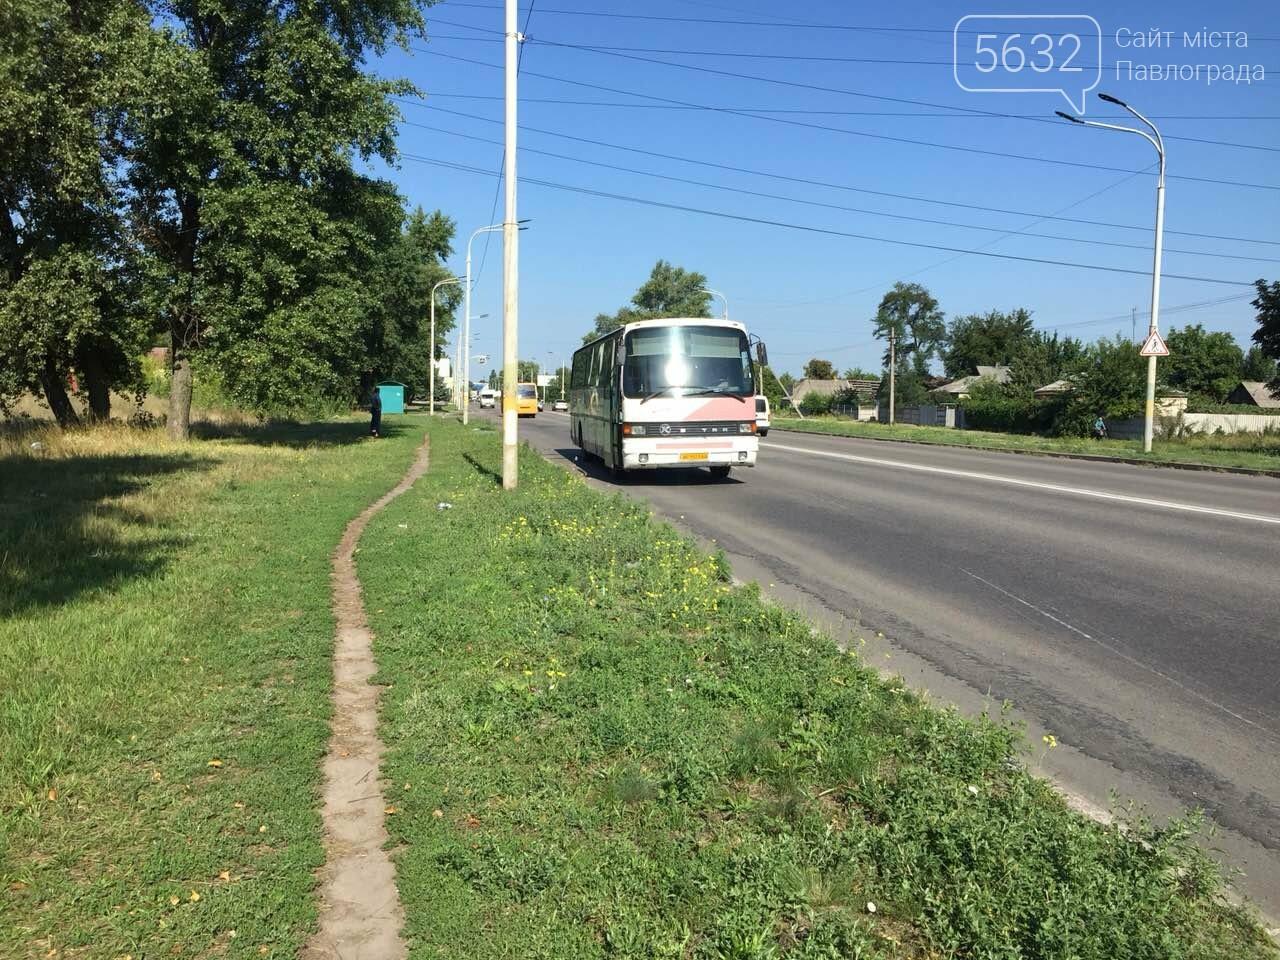 В Павлограде произошло ещё одно ДТП (ФОТО), фото-4